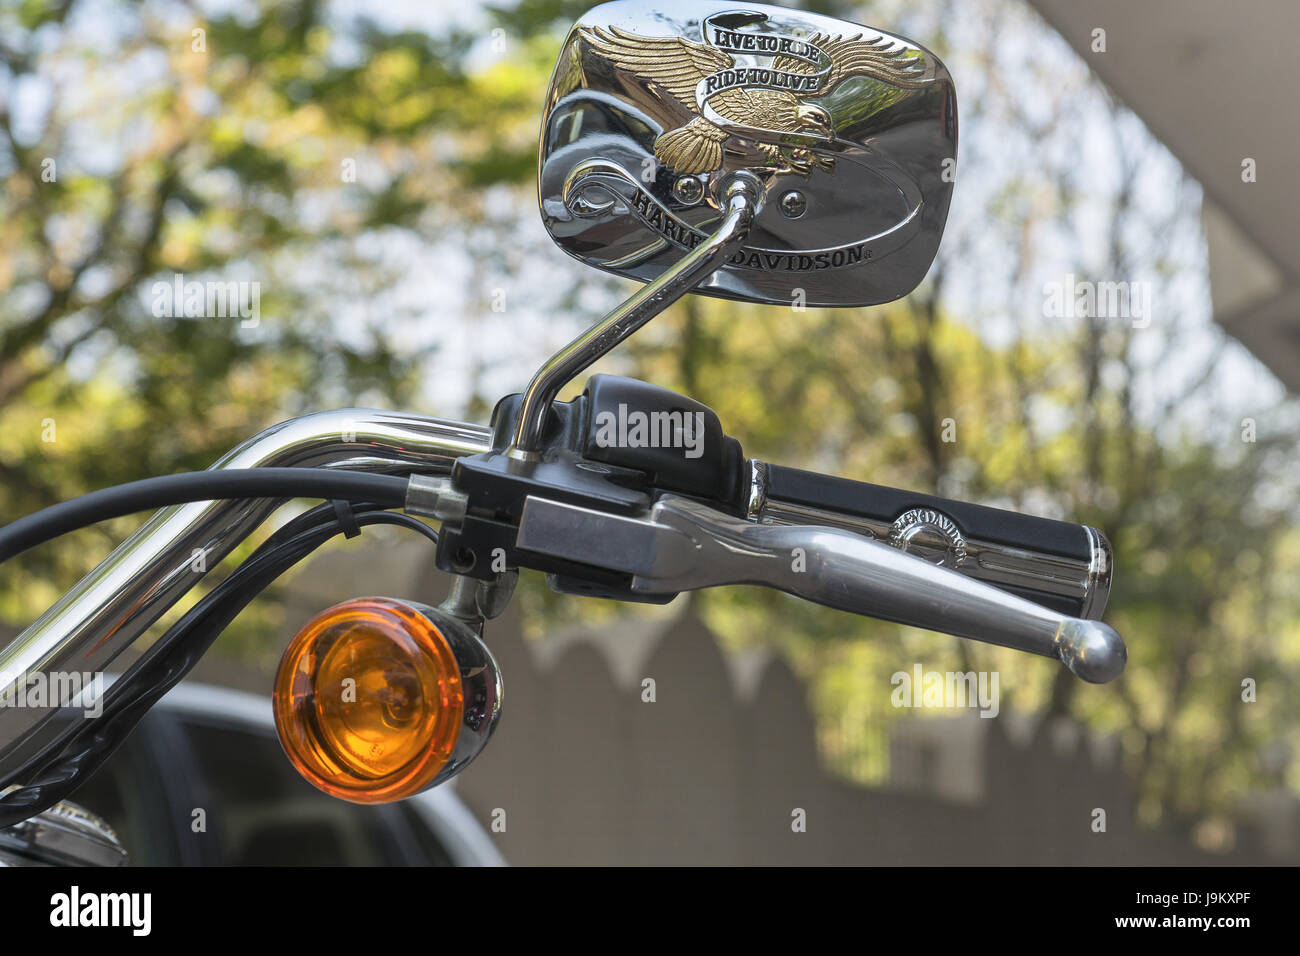 Harley Davidson motorcycle, India, Asia - Stock Image